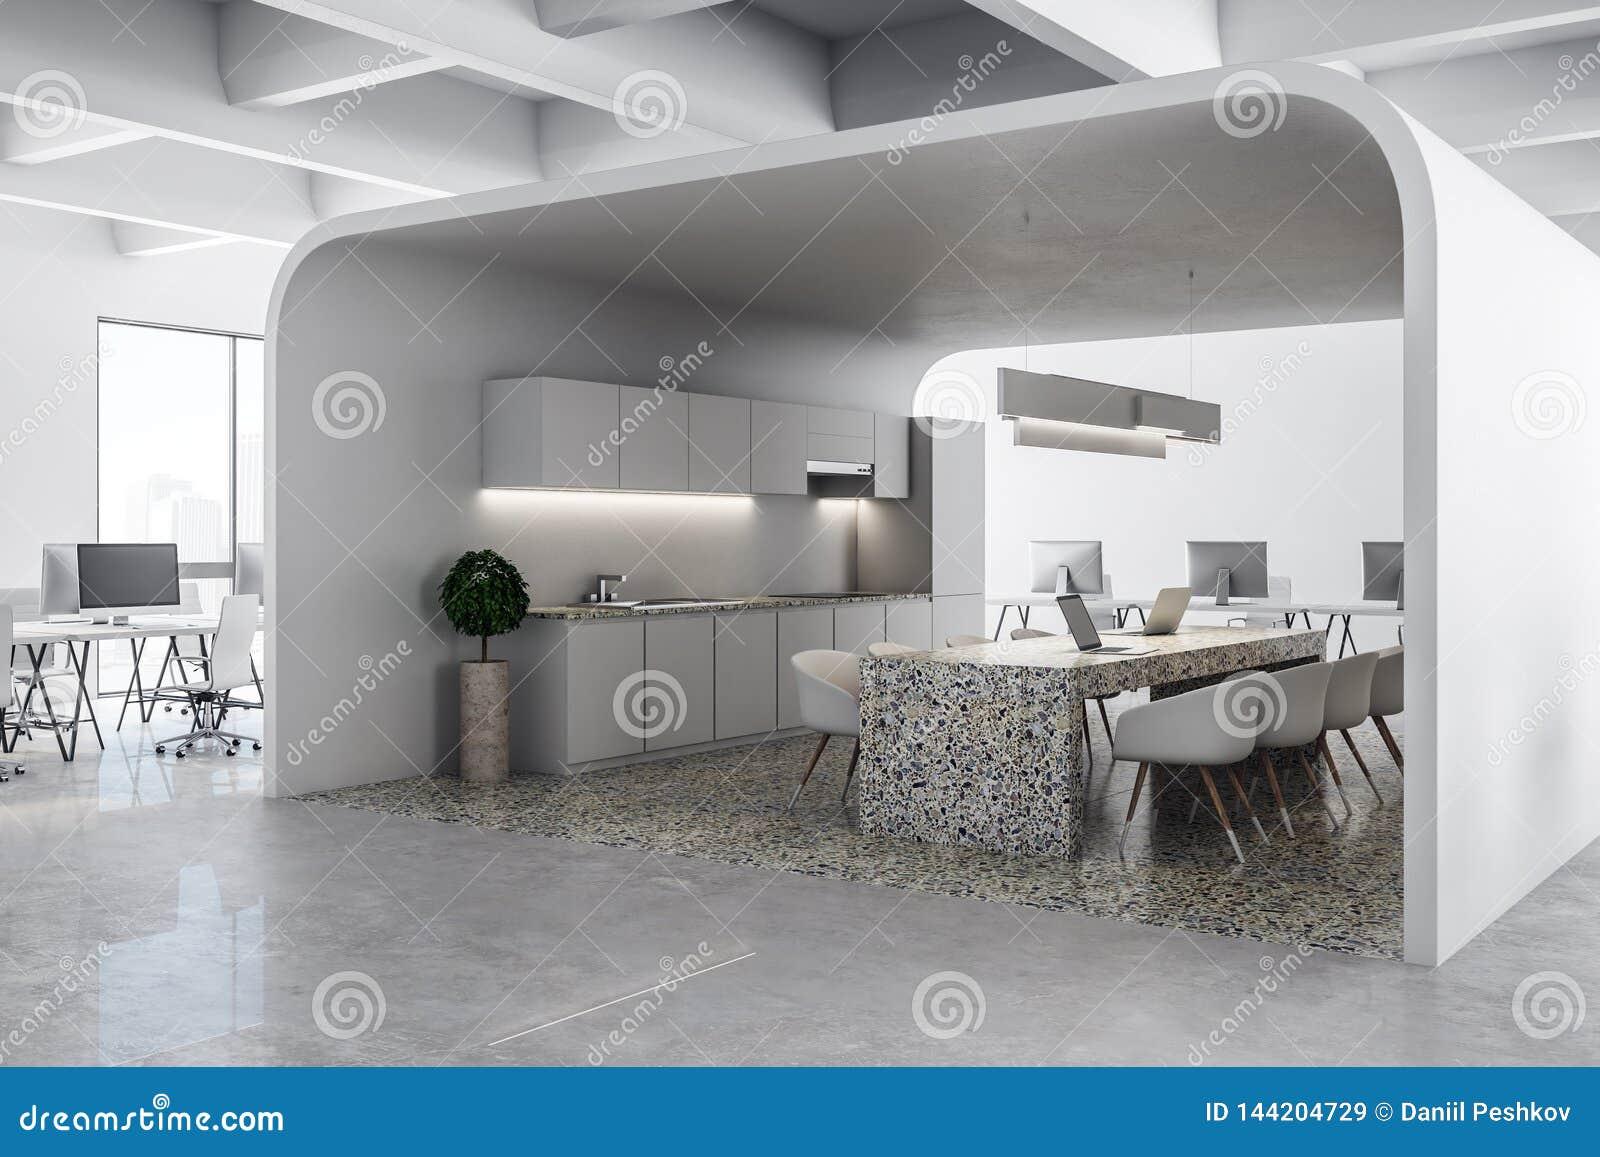 Modern White Office Kitchen Stock Illustration Illustration Of Chairs Indoor 144204729